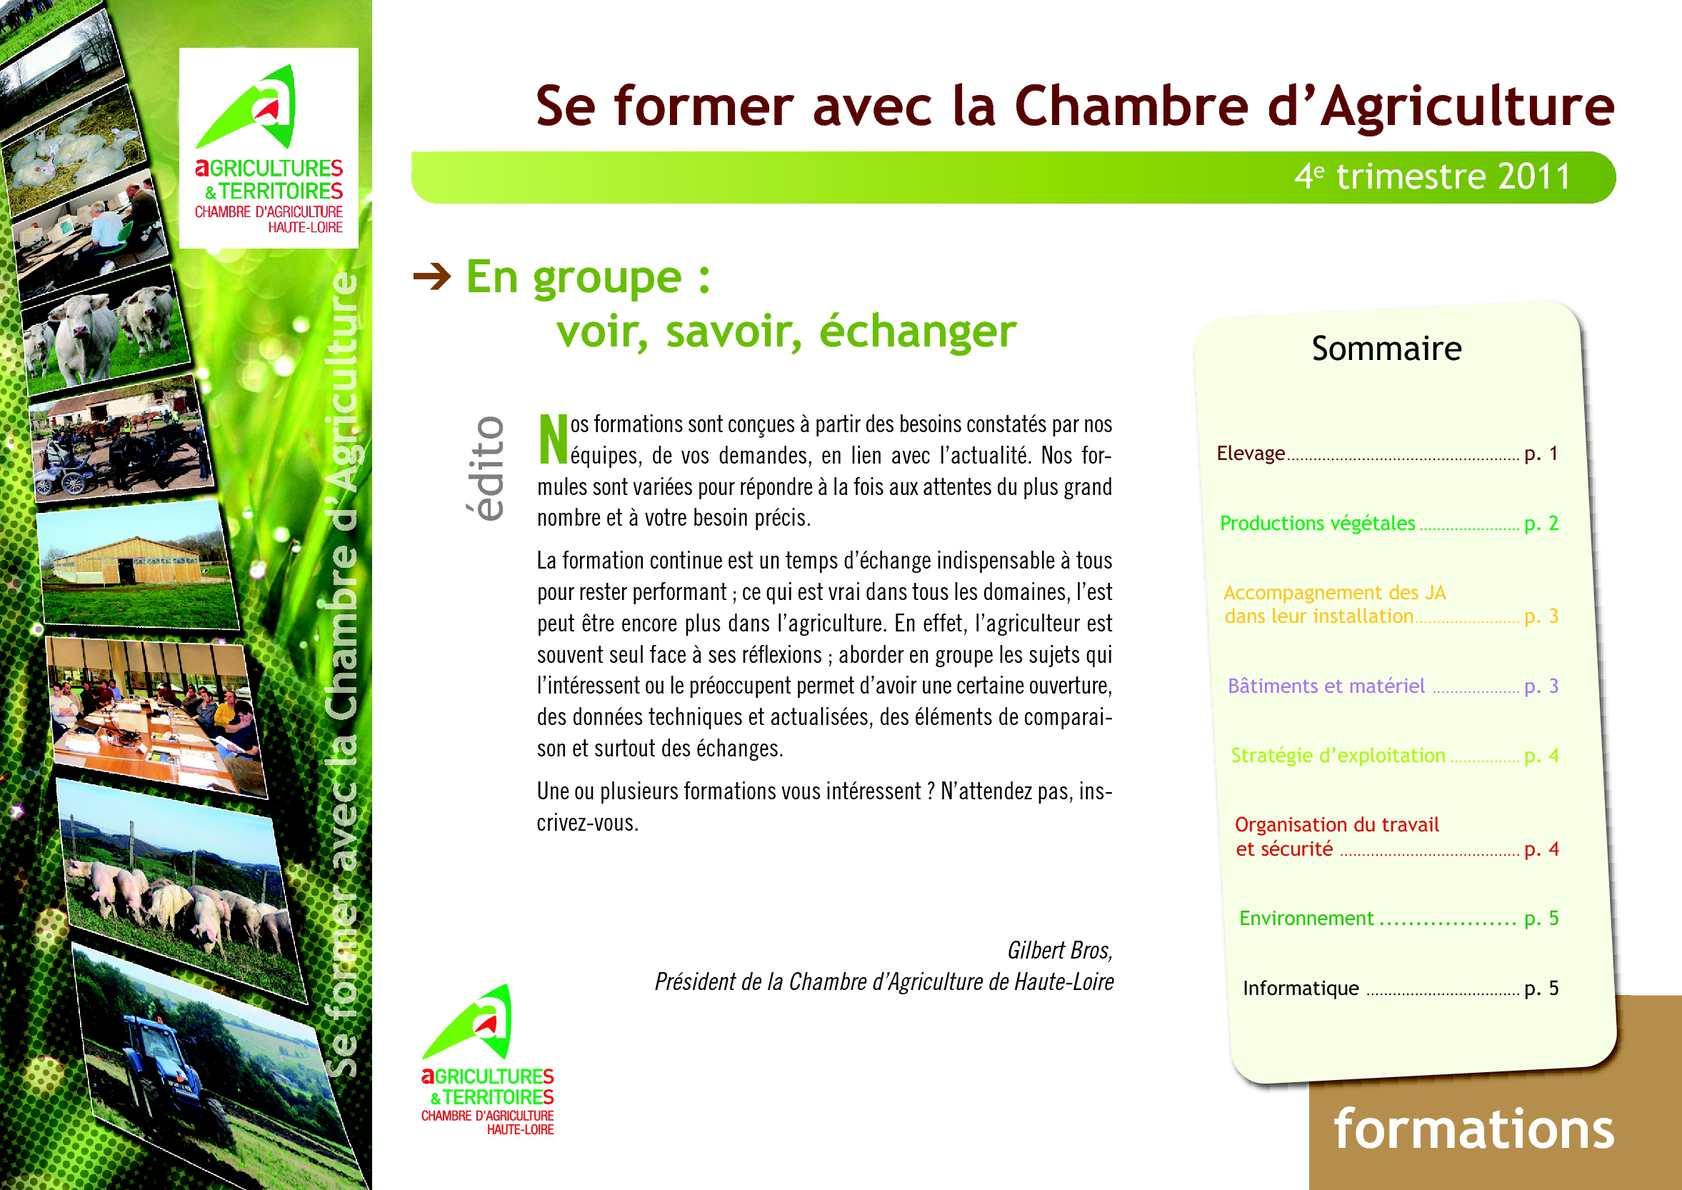 Calam o catalogue formations fin 2011 et d but 2012 feuilleter - Chambre d agriculture 44 ...